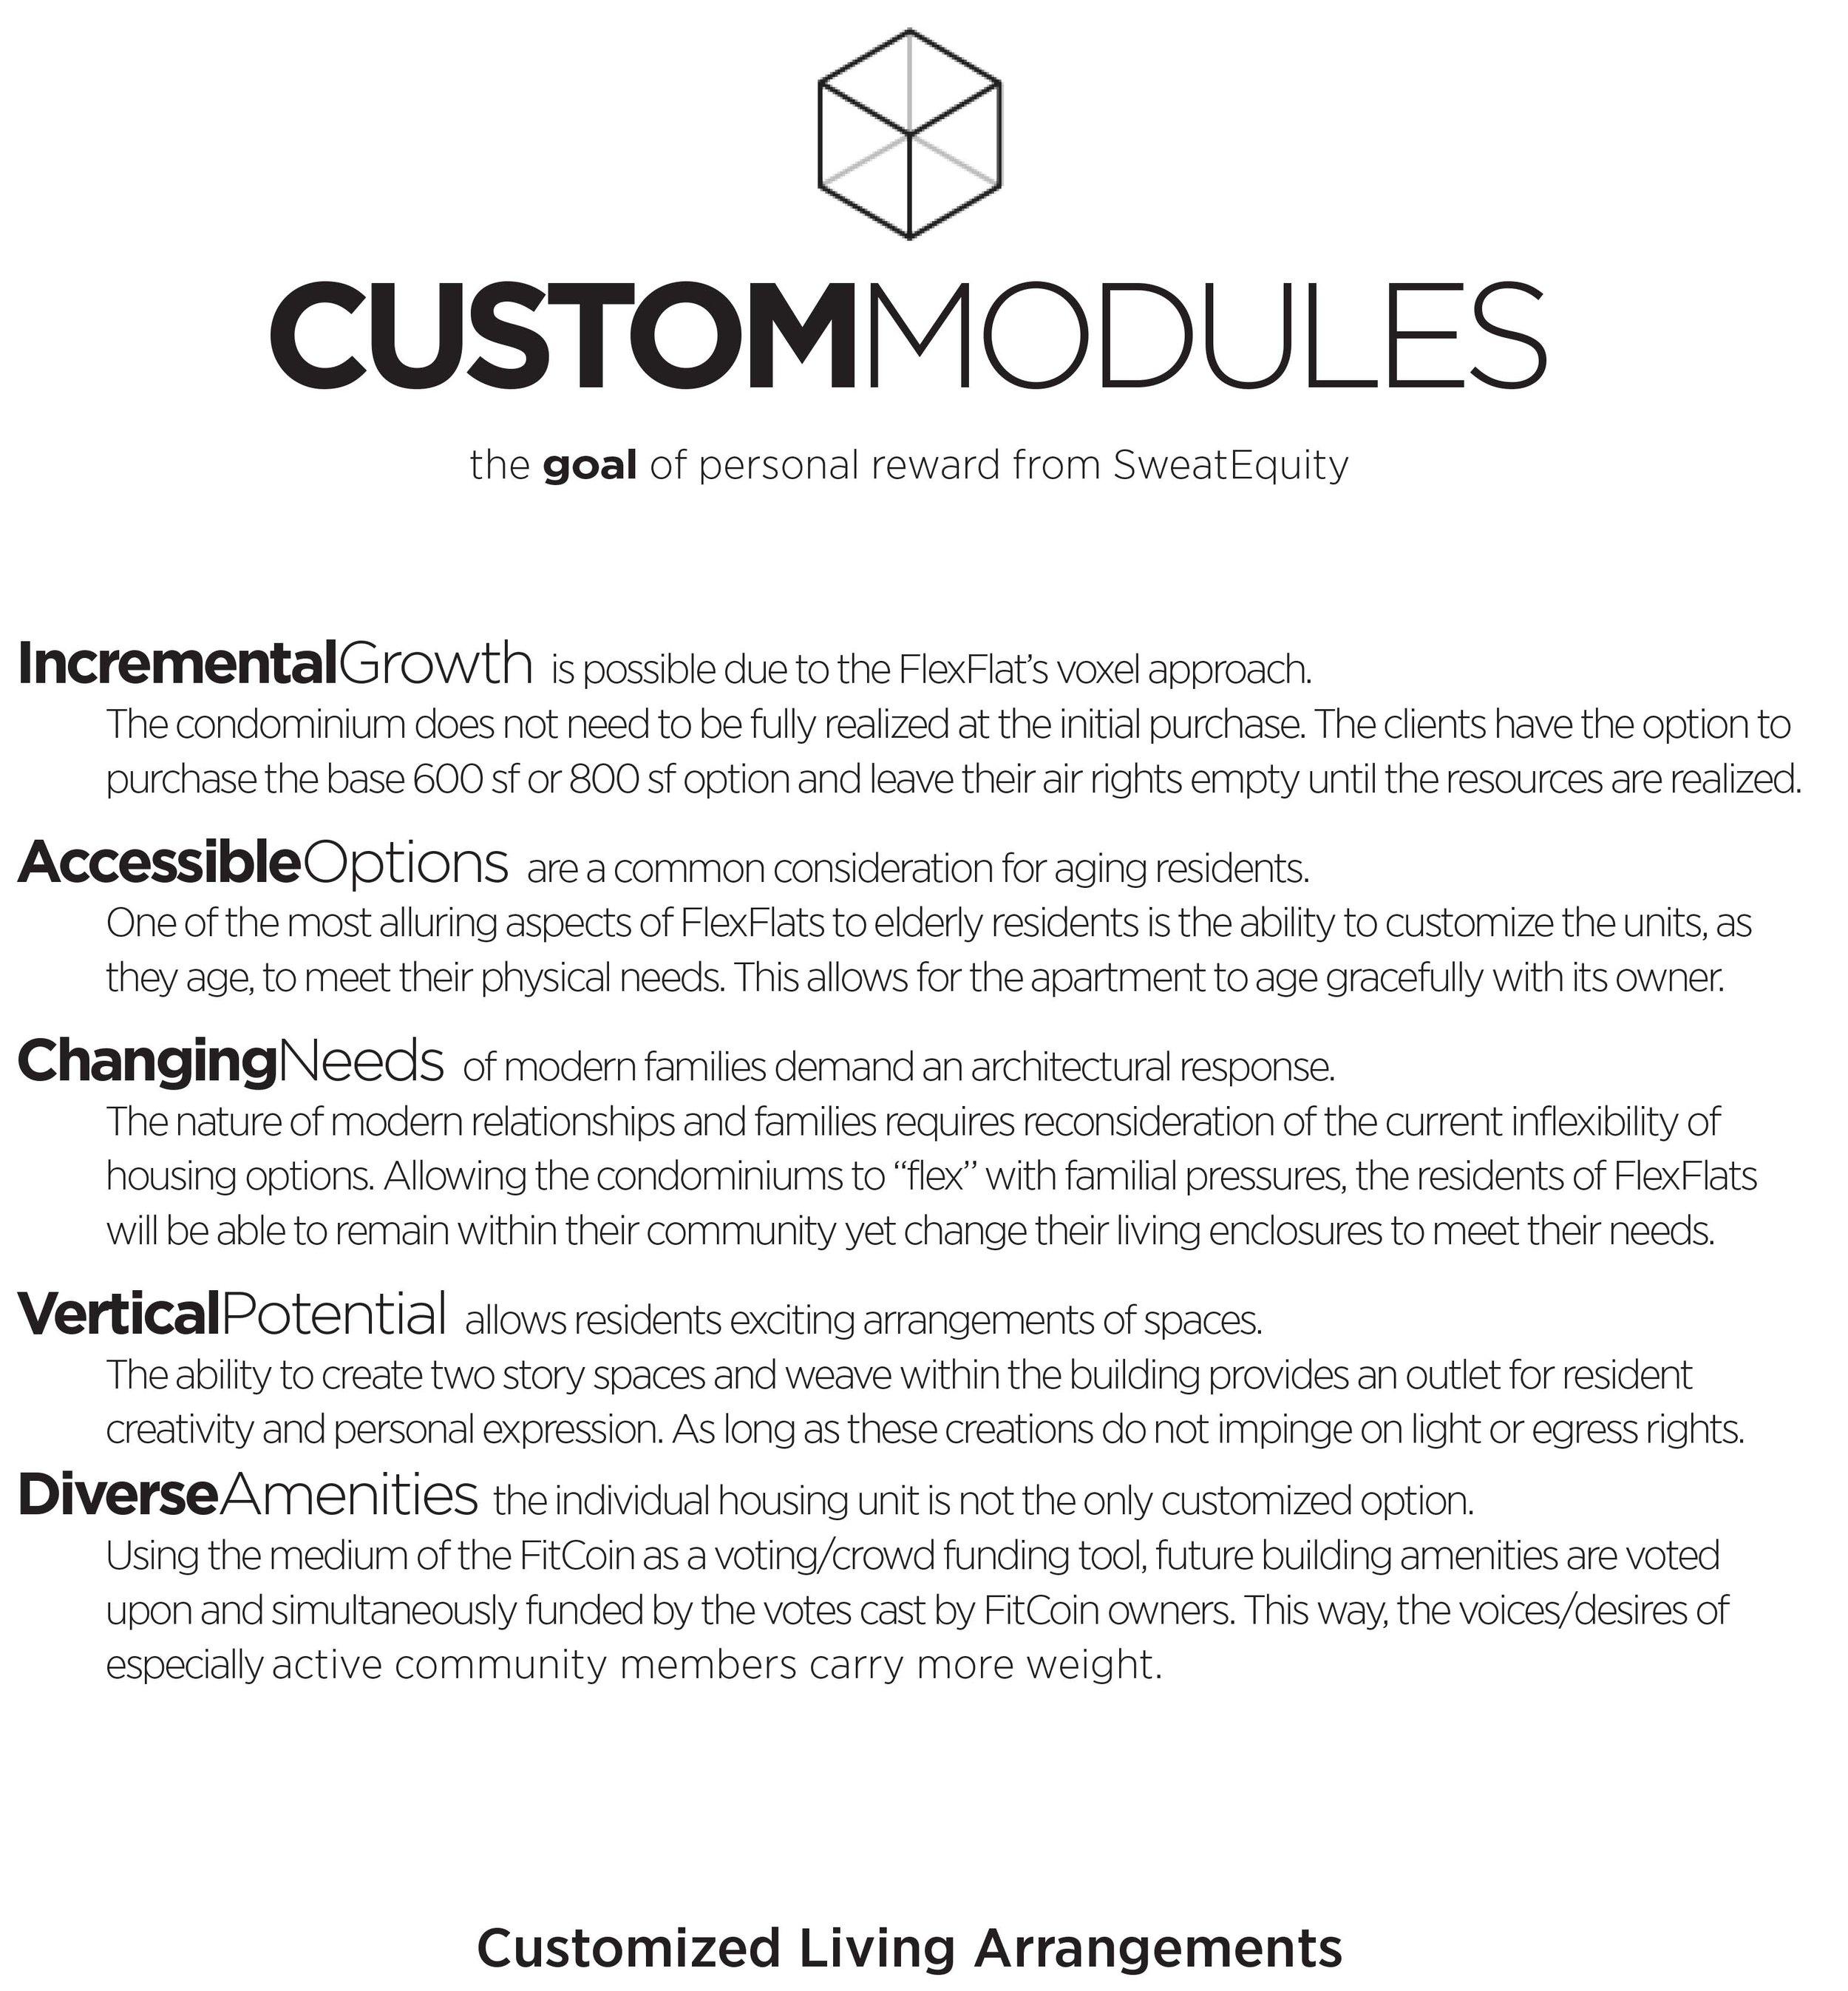 custommodules.jpg